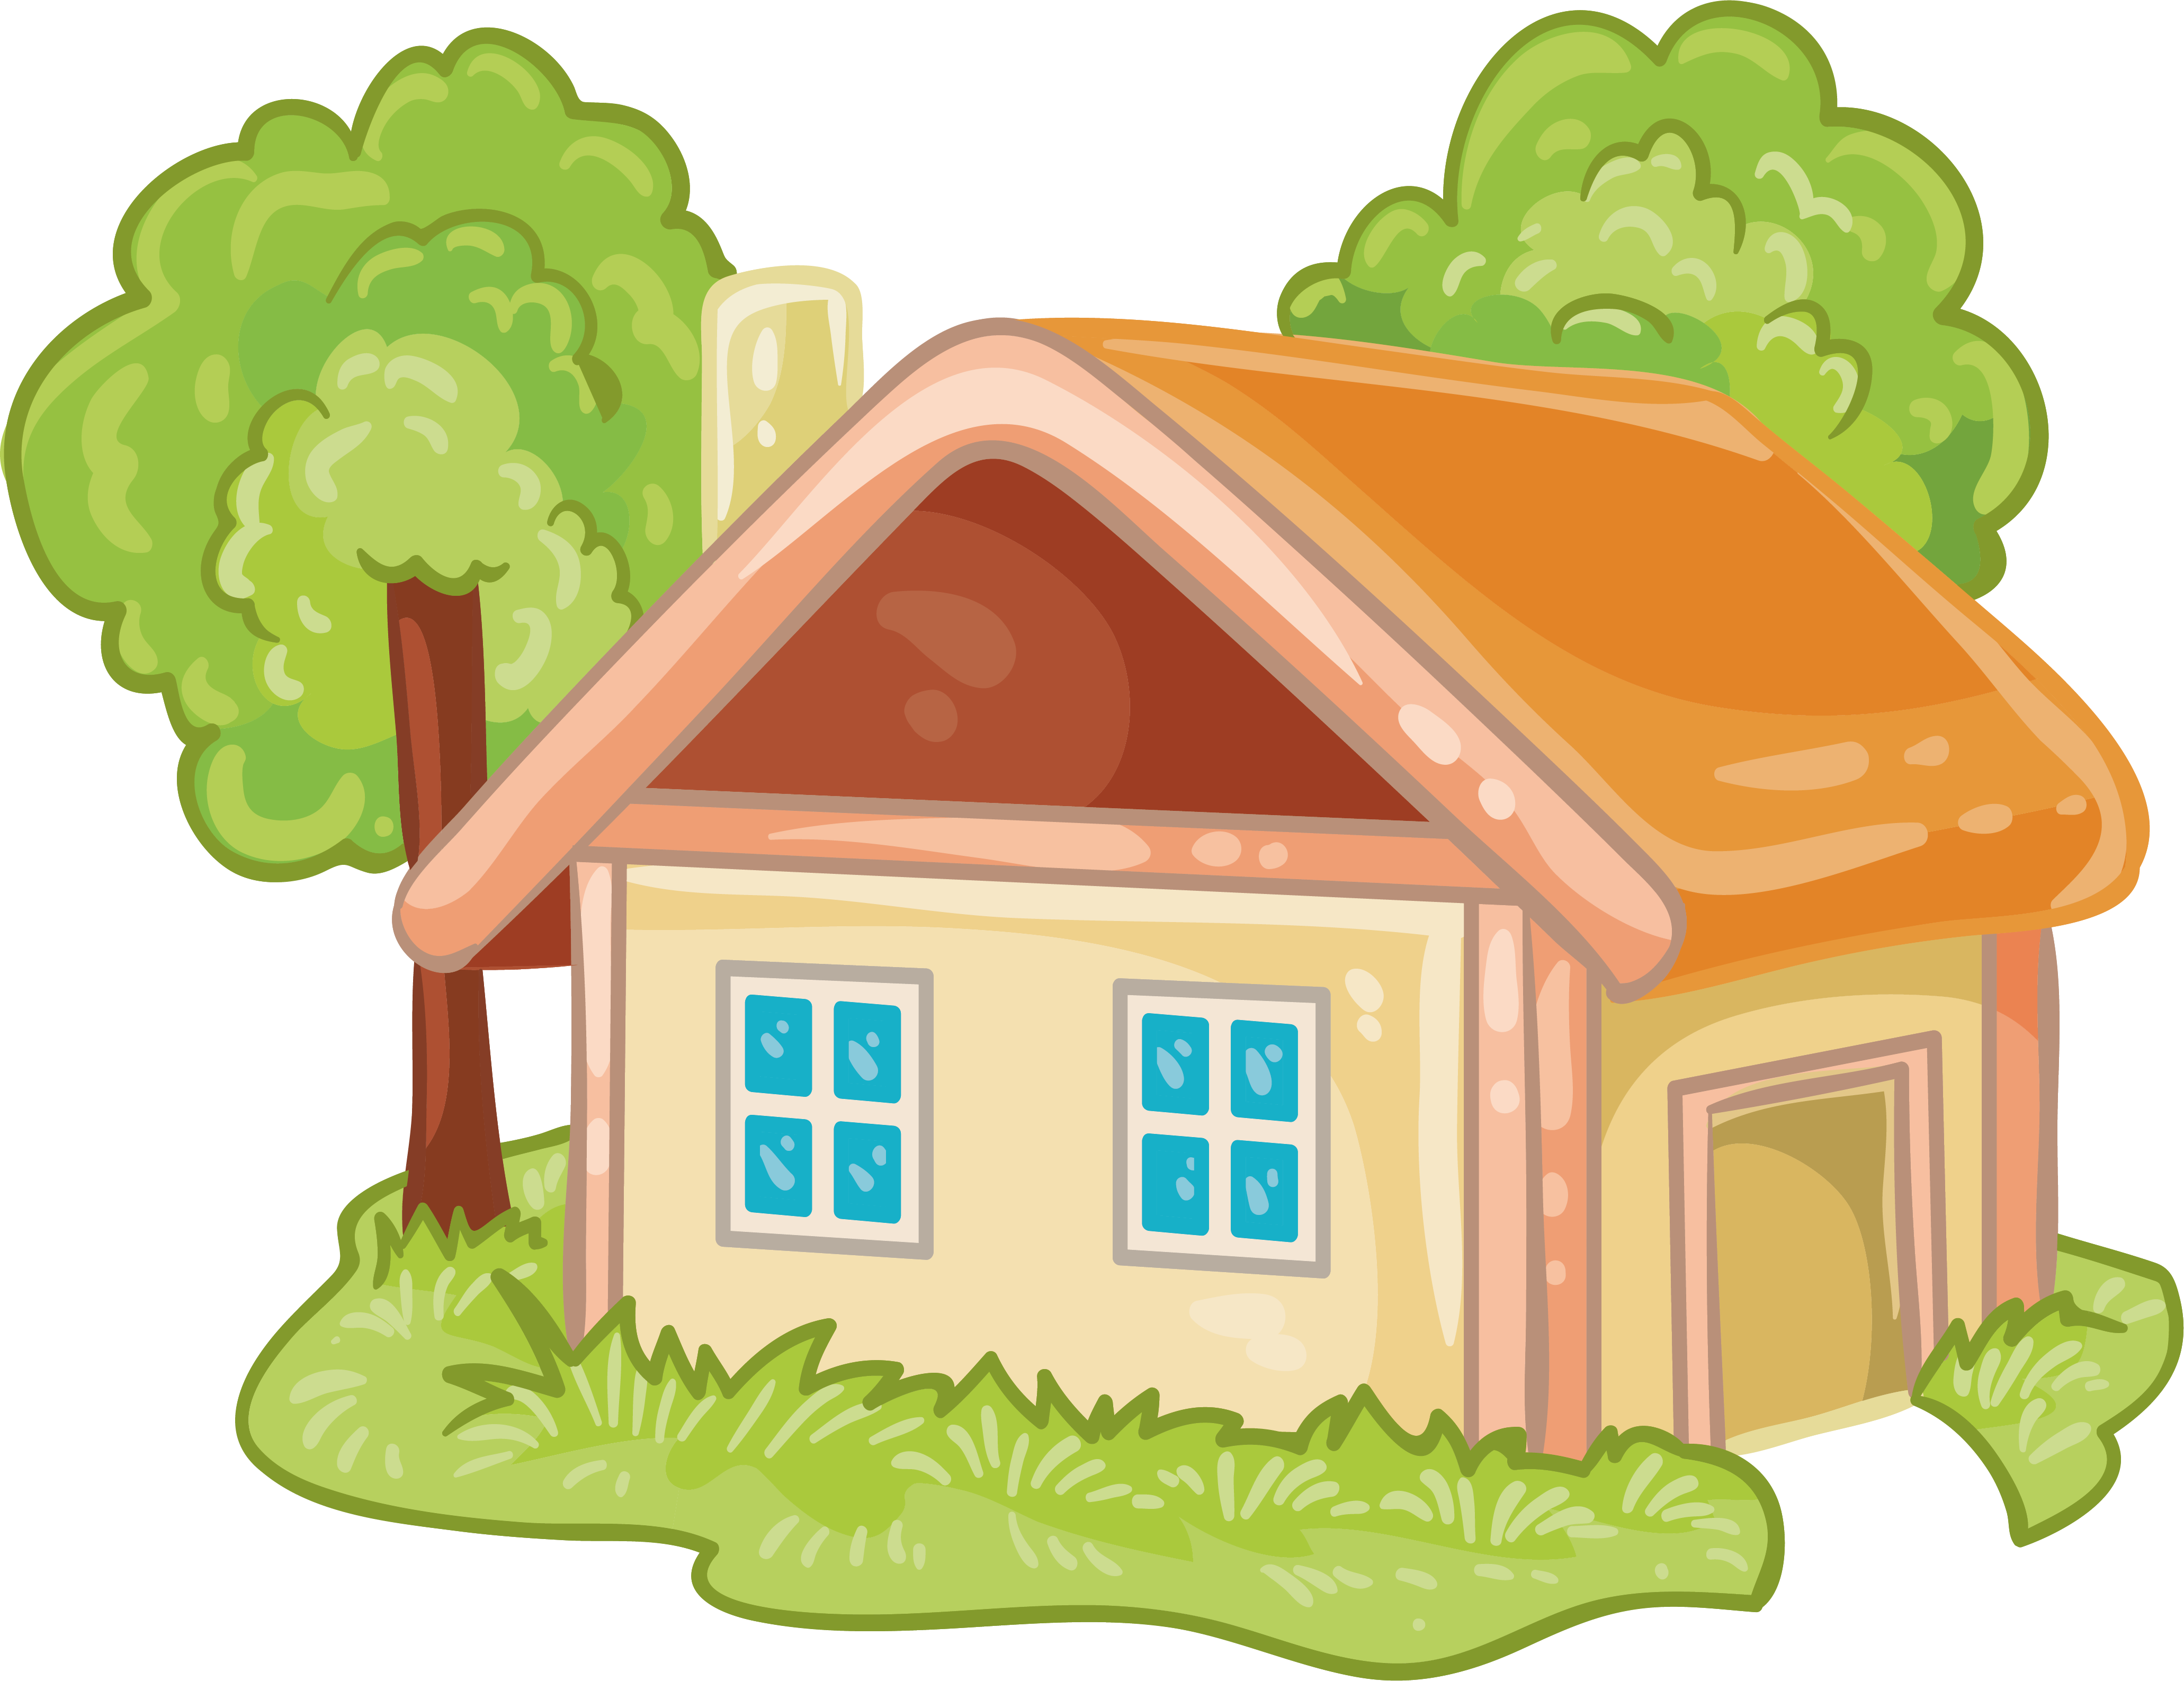 Картинка ребенок в домике